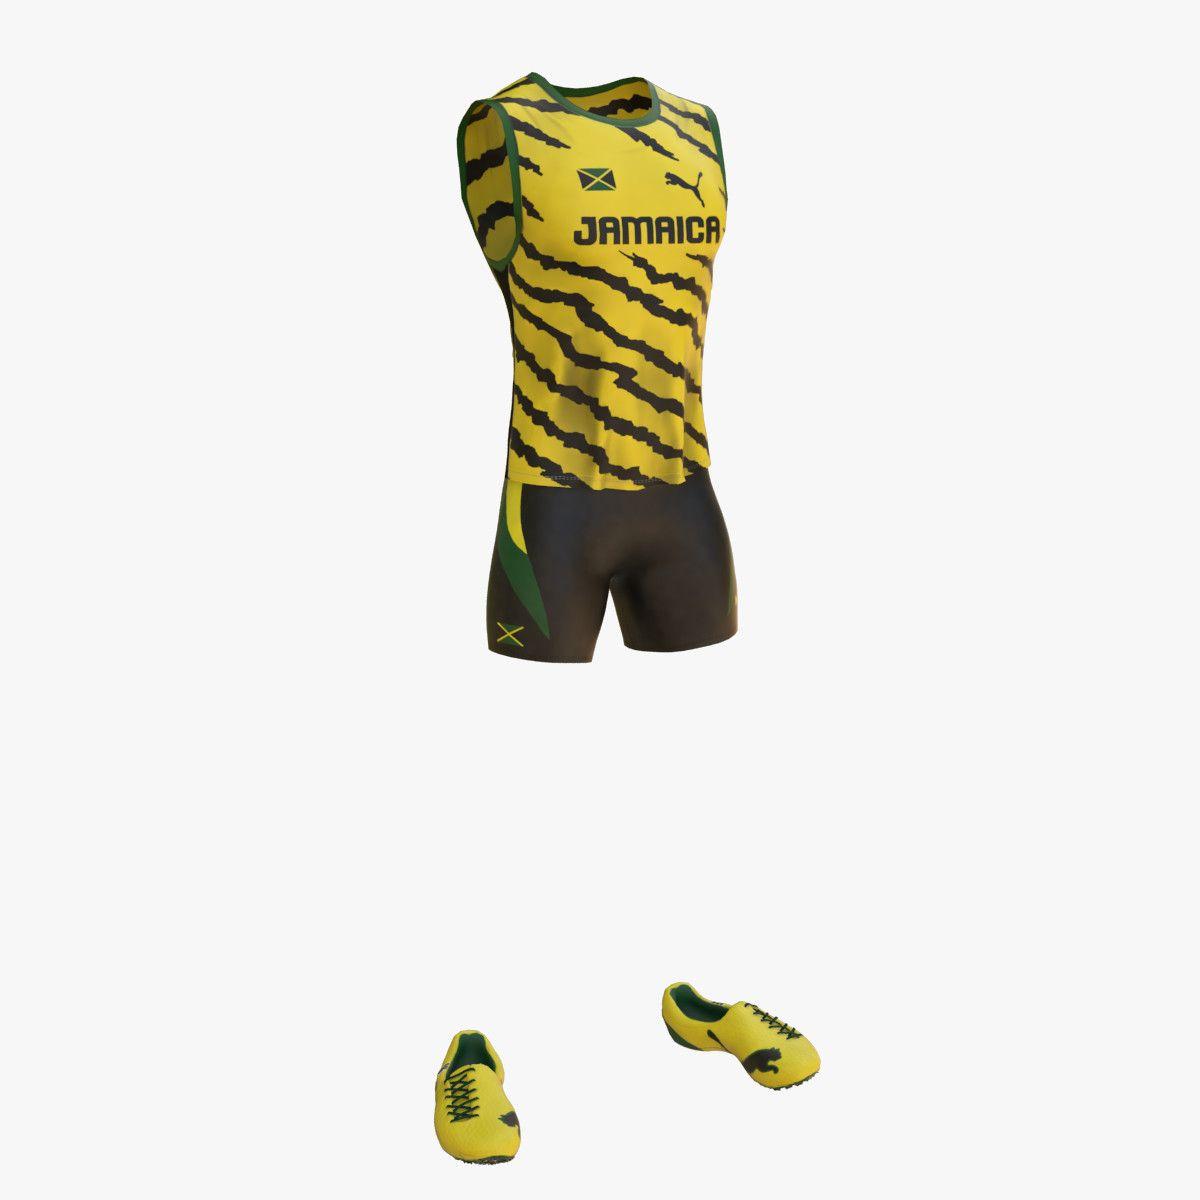 3D Athletics Clothes Model - 3D Model | atletizim | Athletic